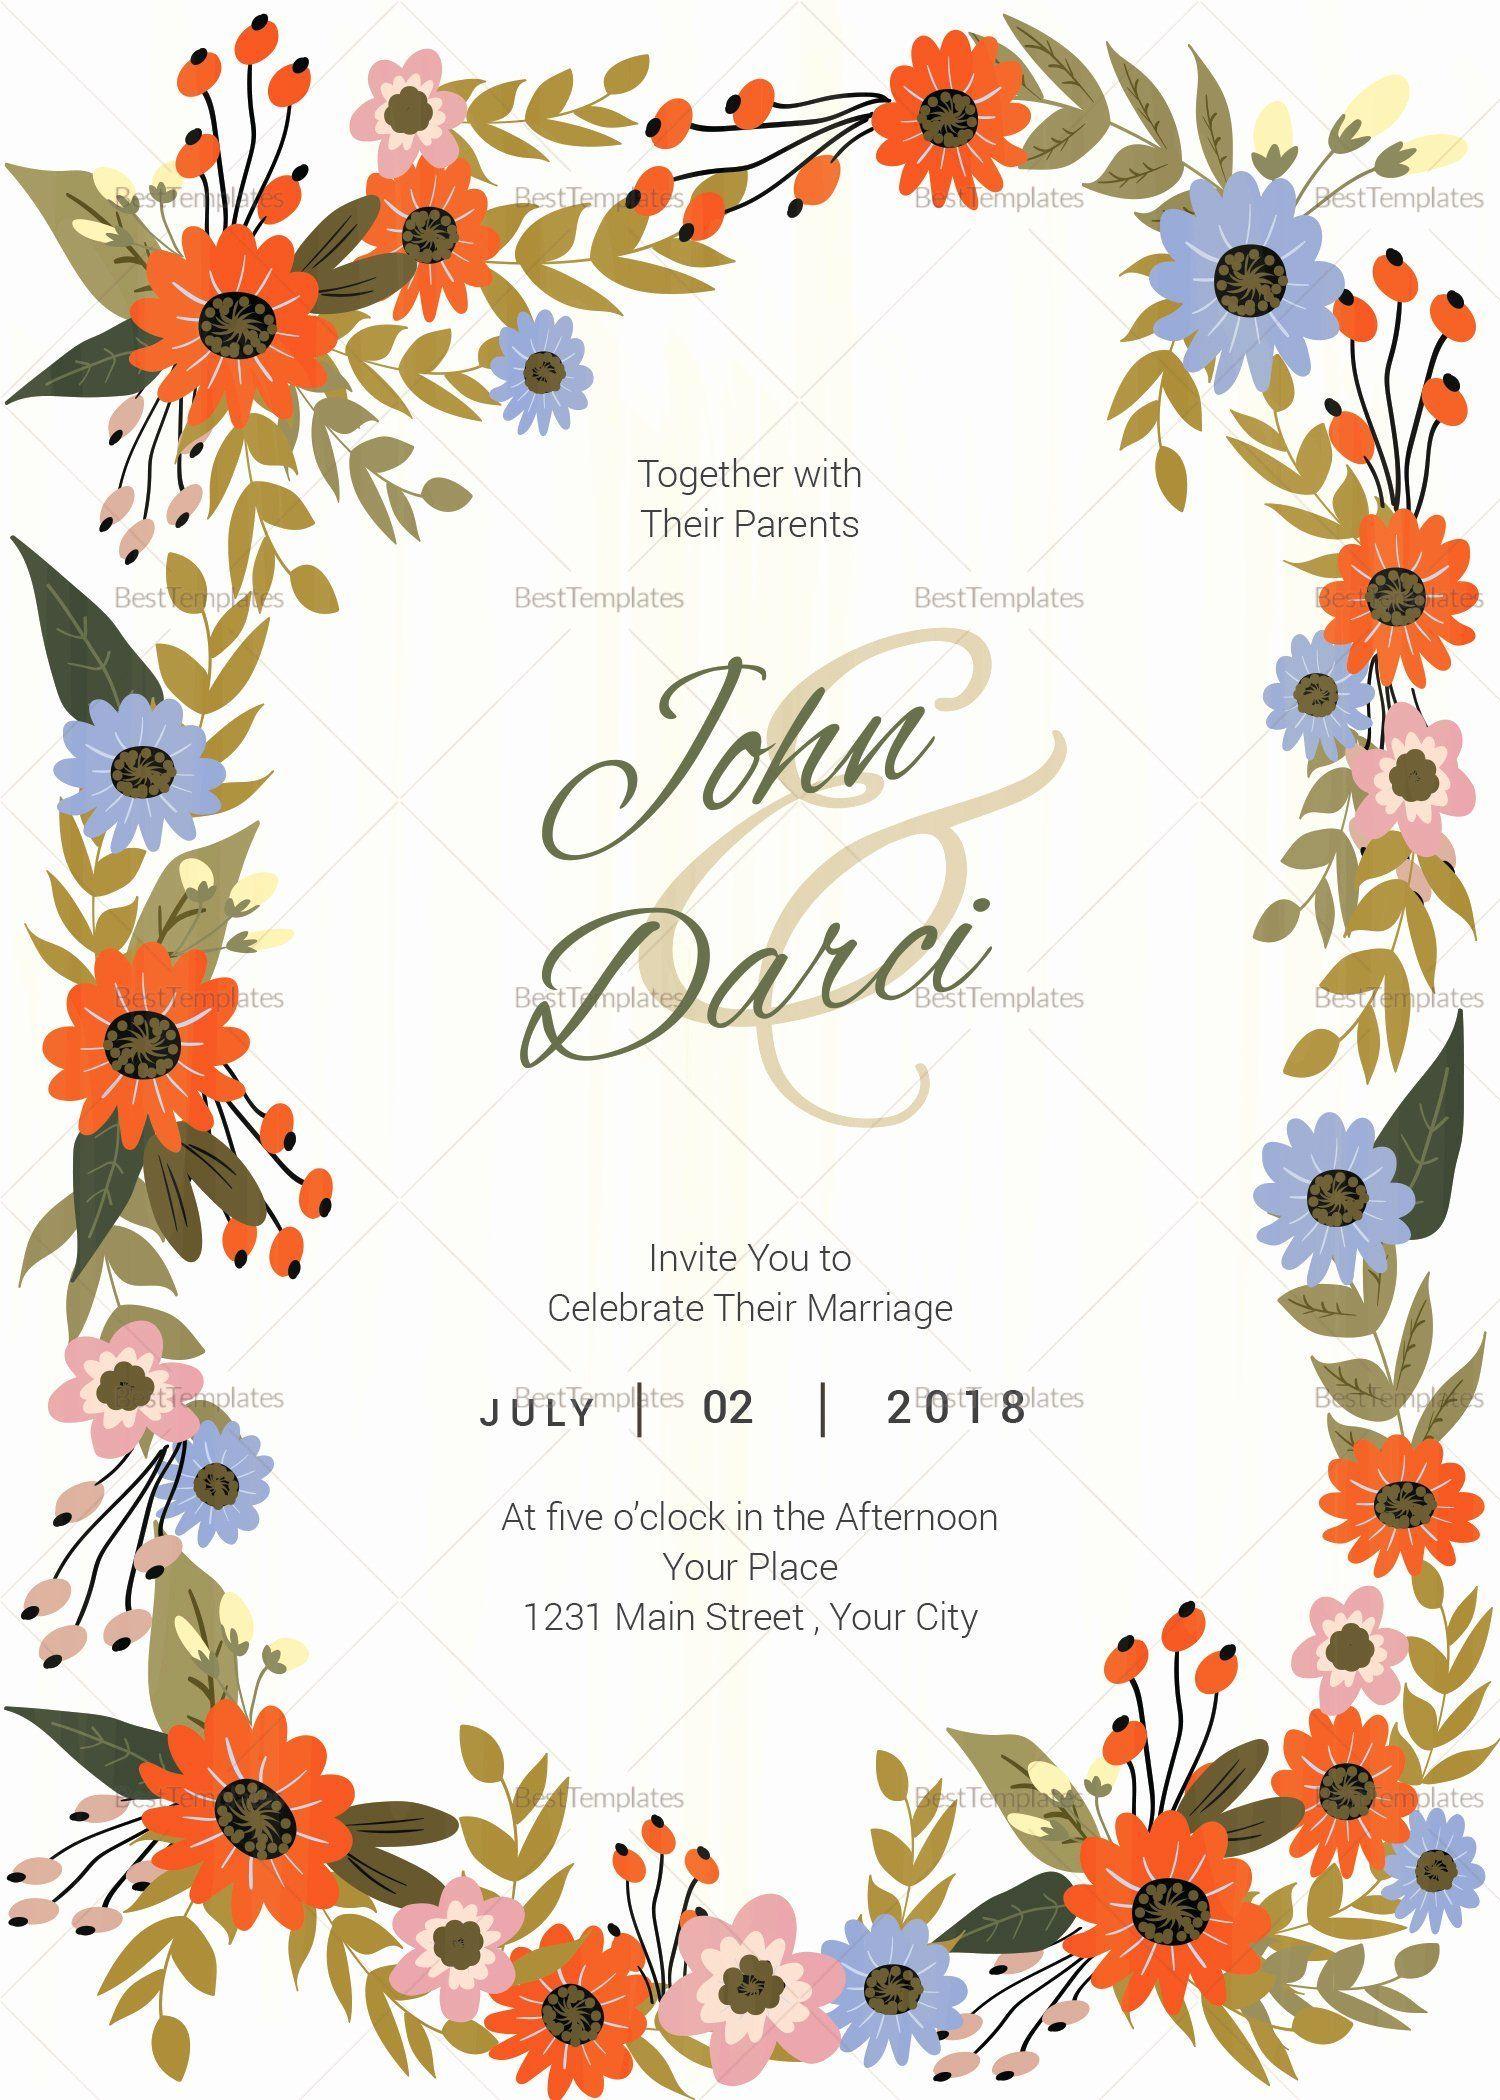 Microsoft Publisher Wedding Invitation Template Lovely Summer Flo